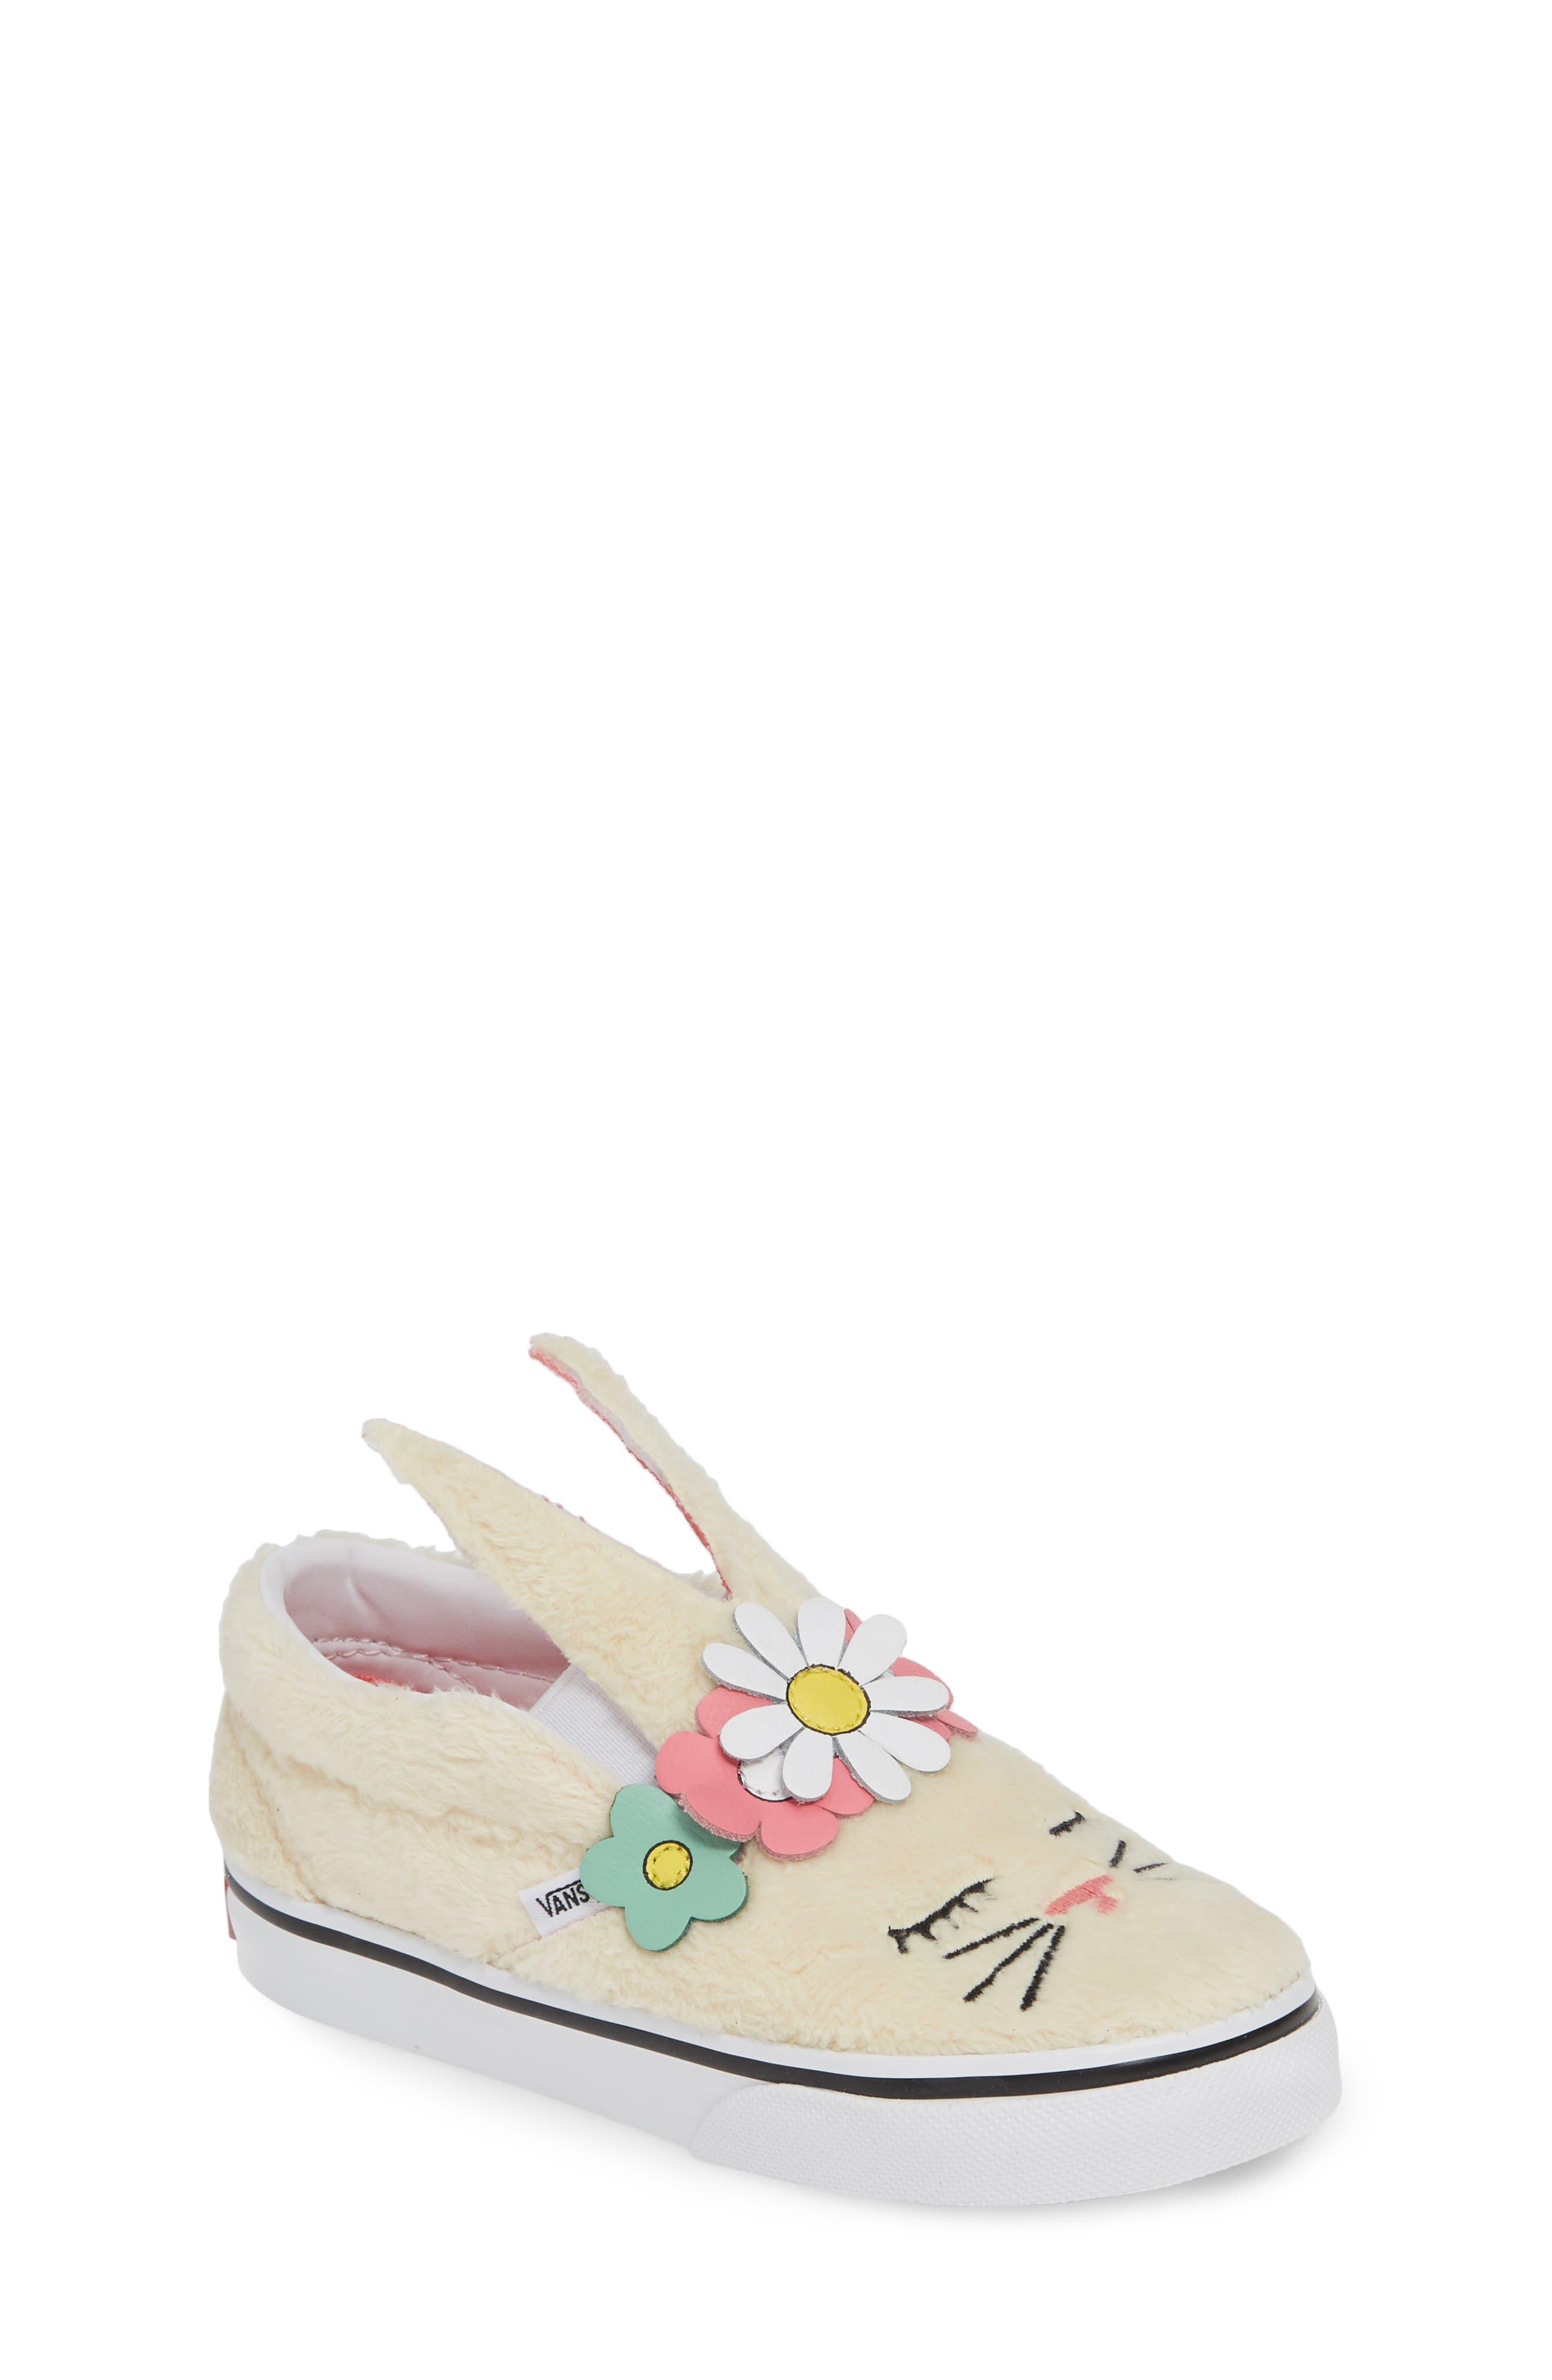 VANS, Slip-On Bunny Sneaker, Main thumbnail 1, color, VANILLA CUSTARD